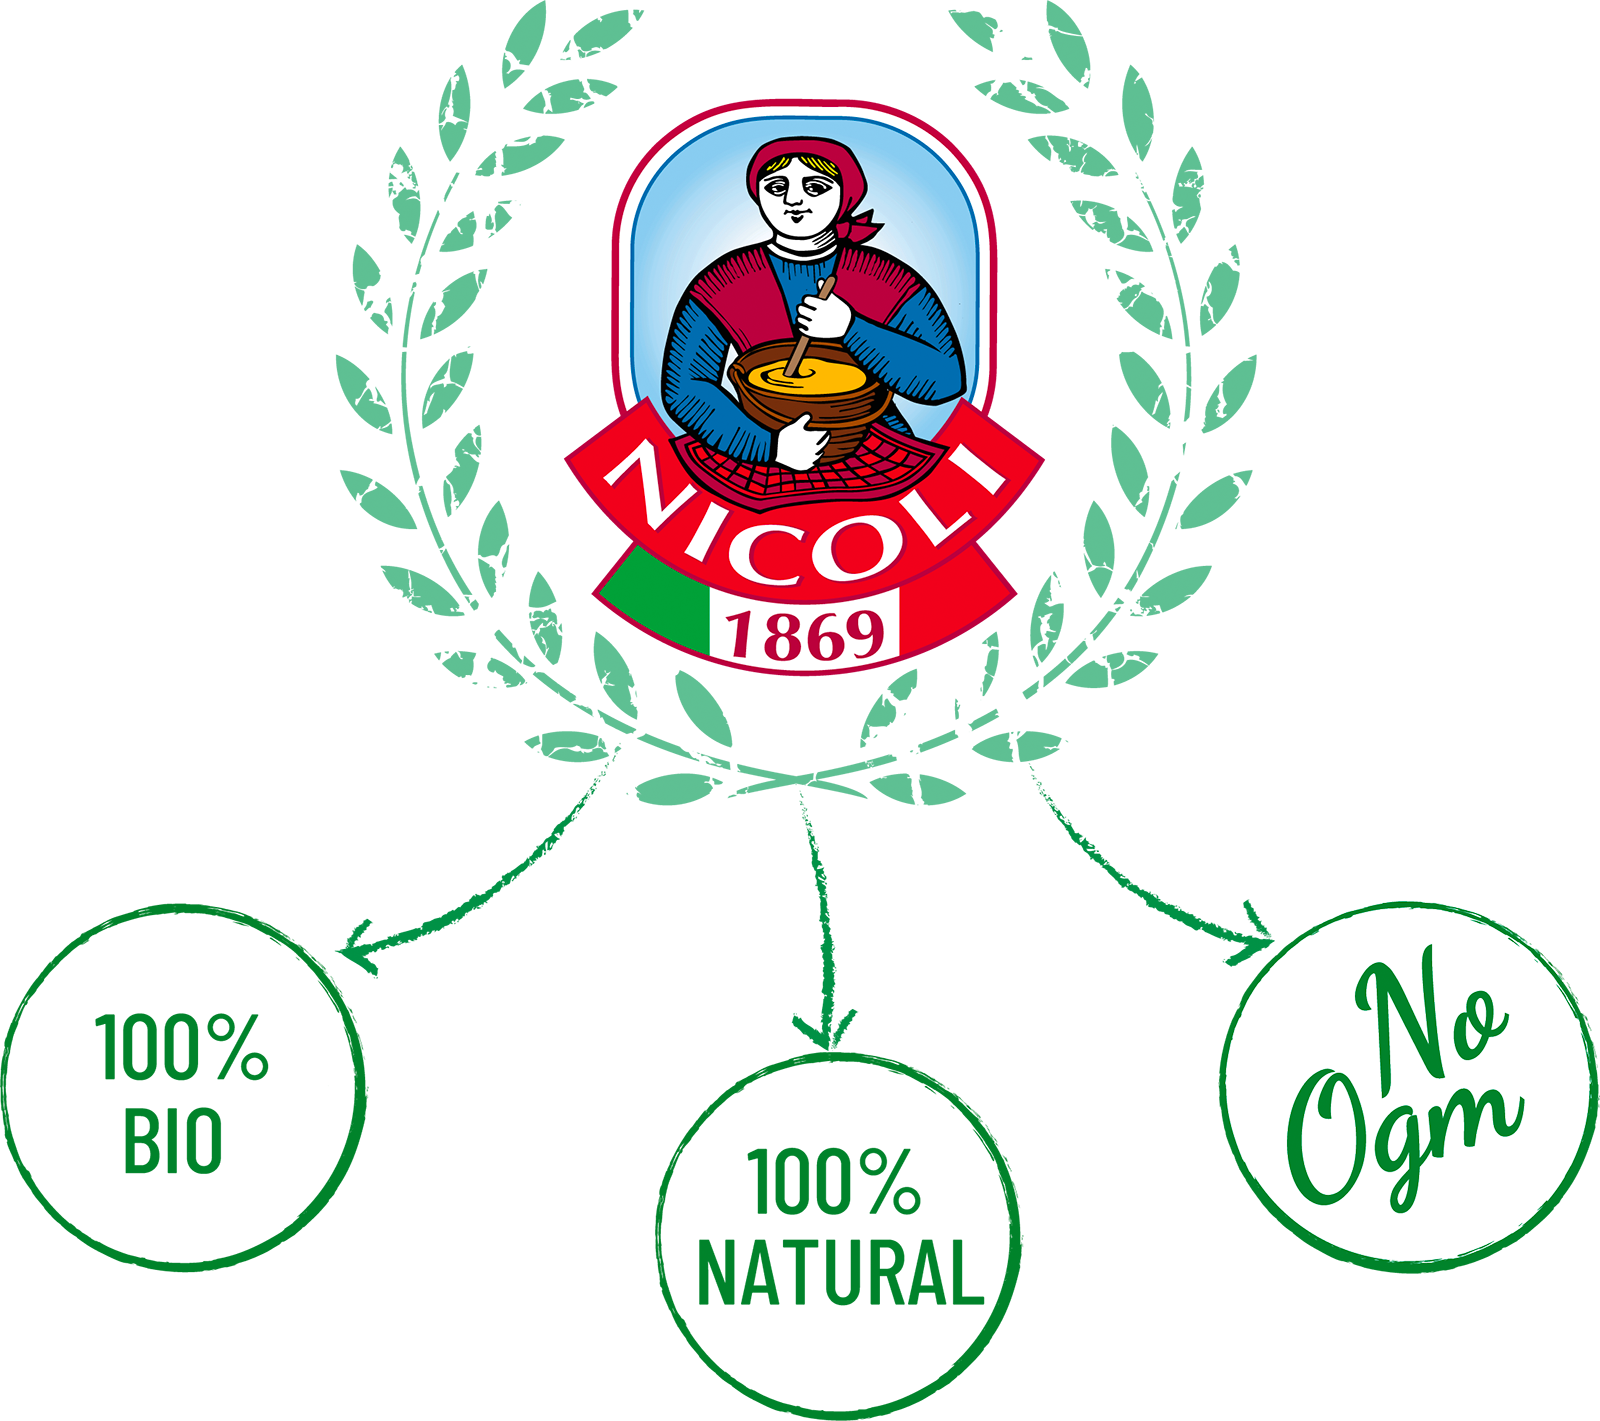 Nicoli Biologico, Naturale, No Ogm